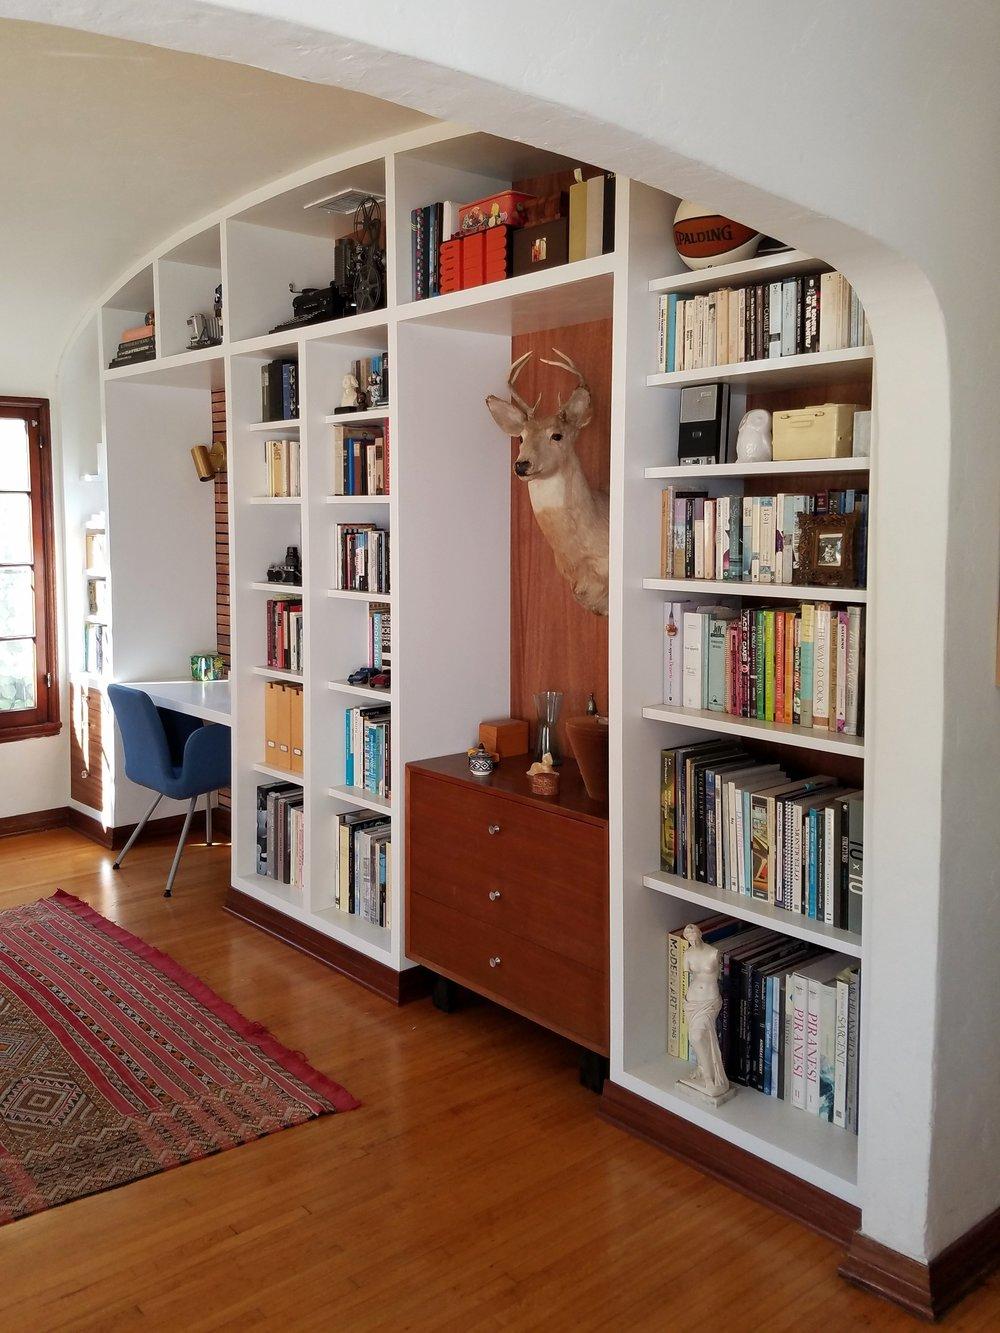 CUSTOM BUILT-IN BOOKCASE & DESK NICHE IN LIVING ROOM